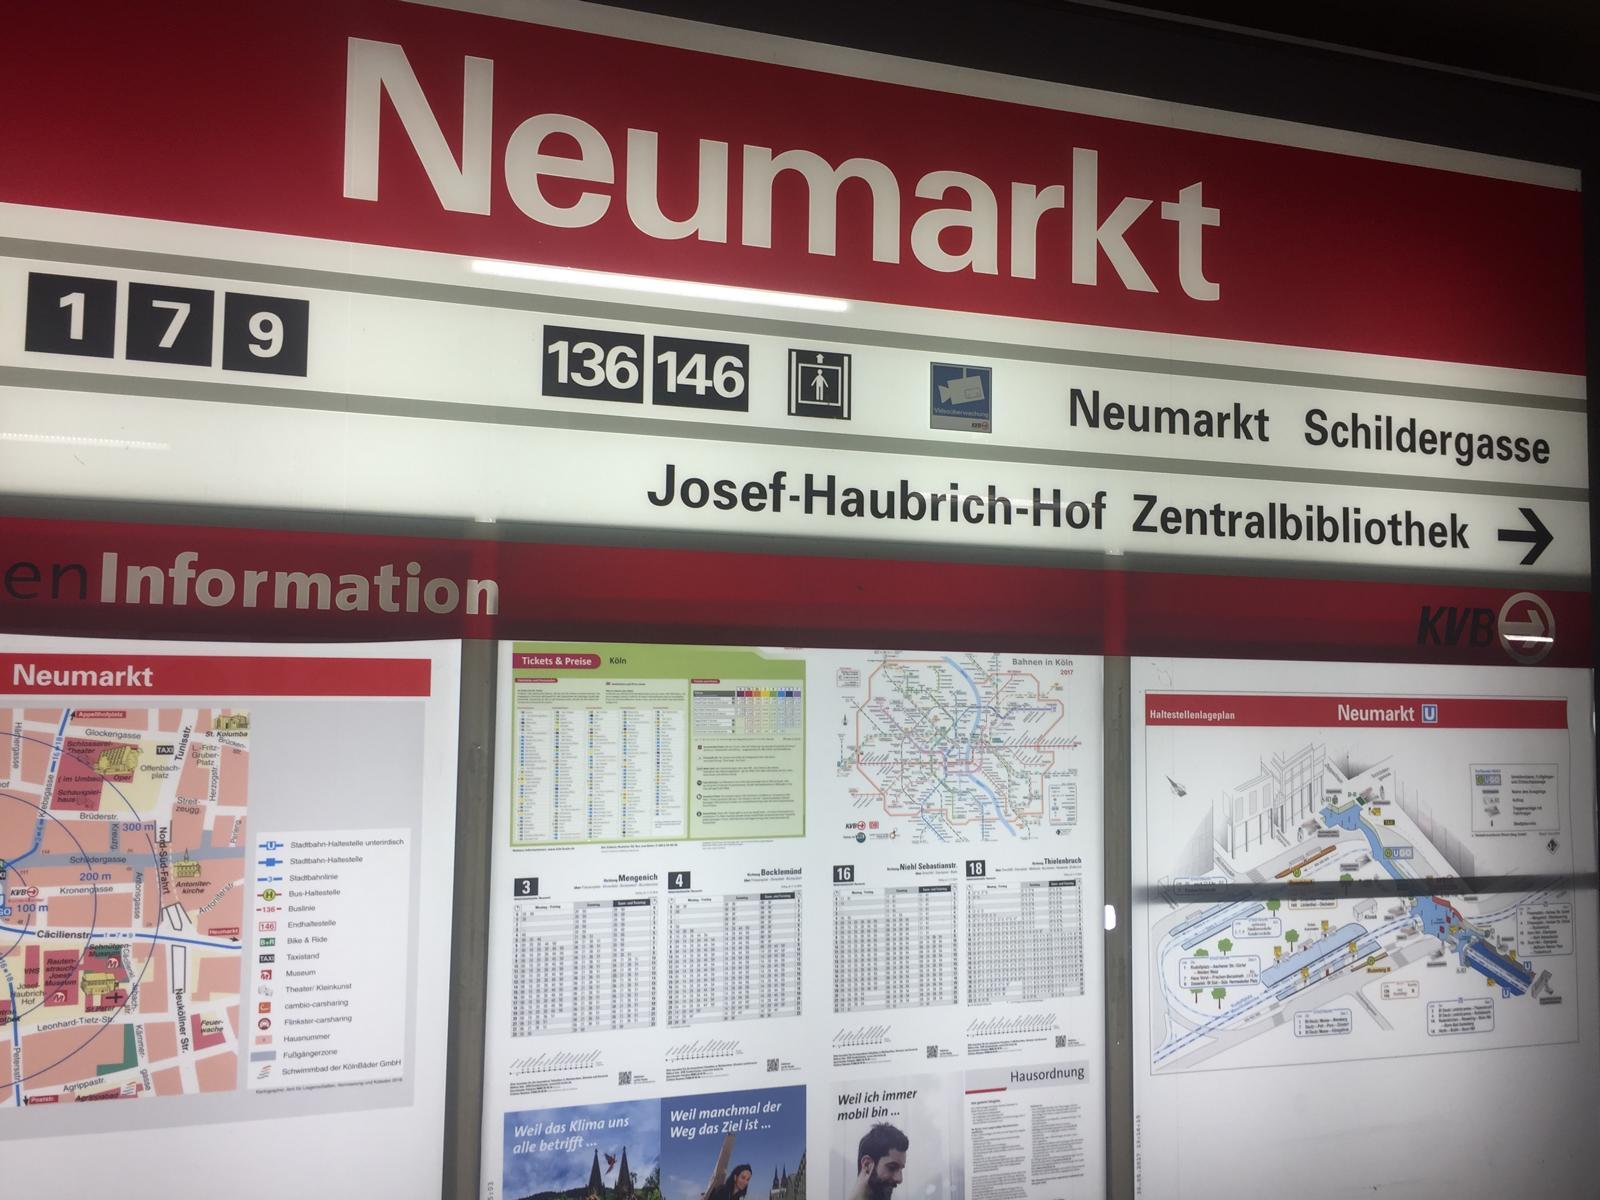 Verkehrsknoten Neumarkt